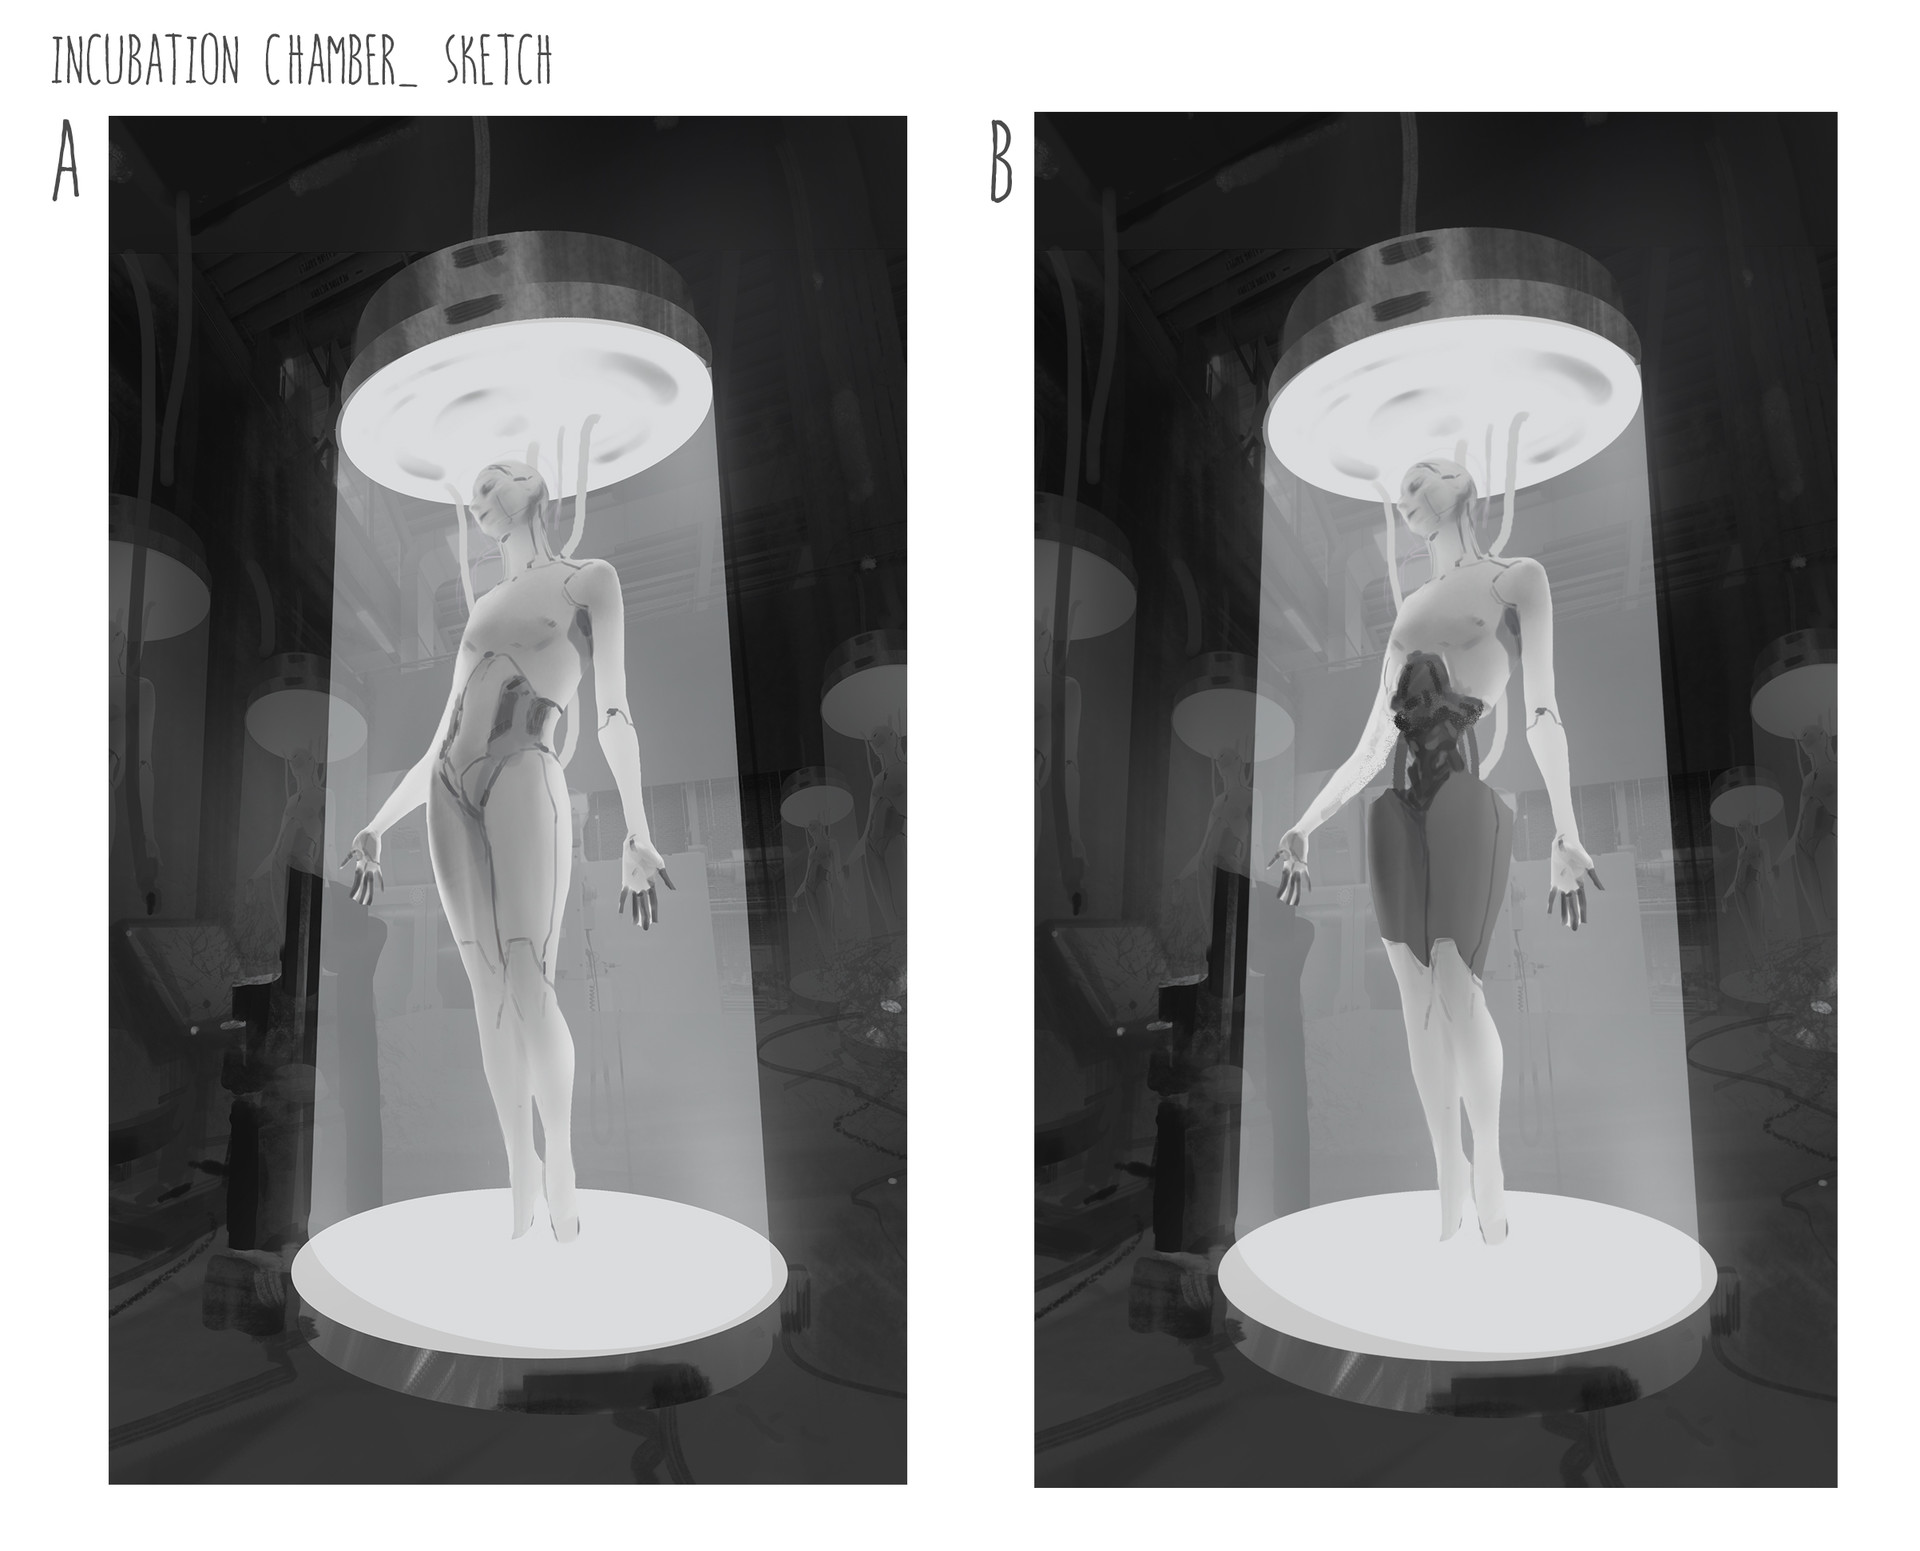 Yujin choo incubation chamber sketch